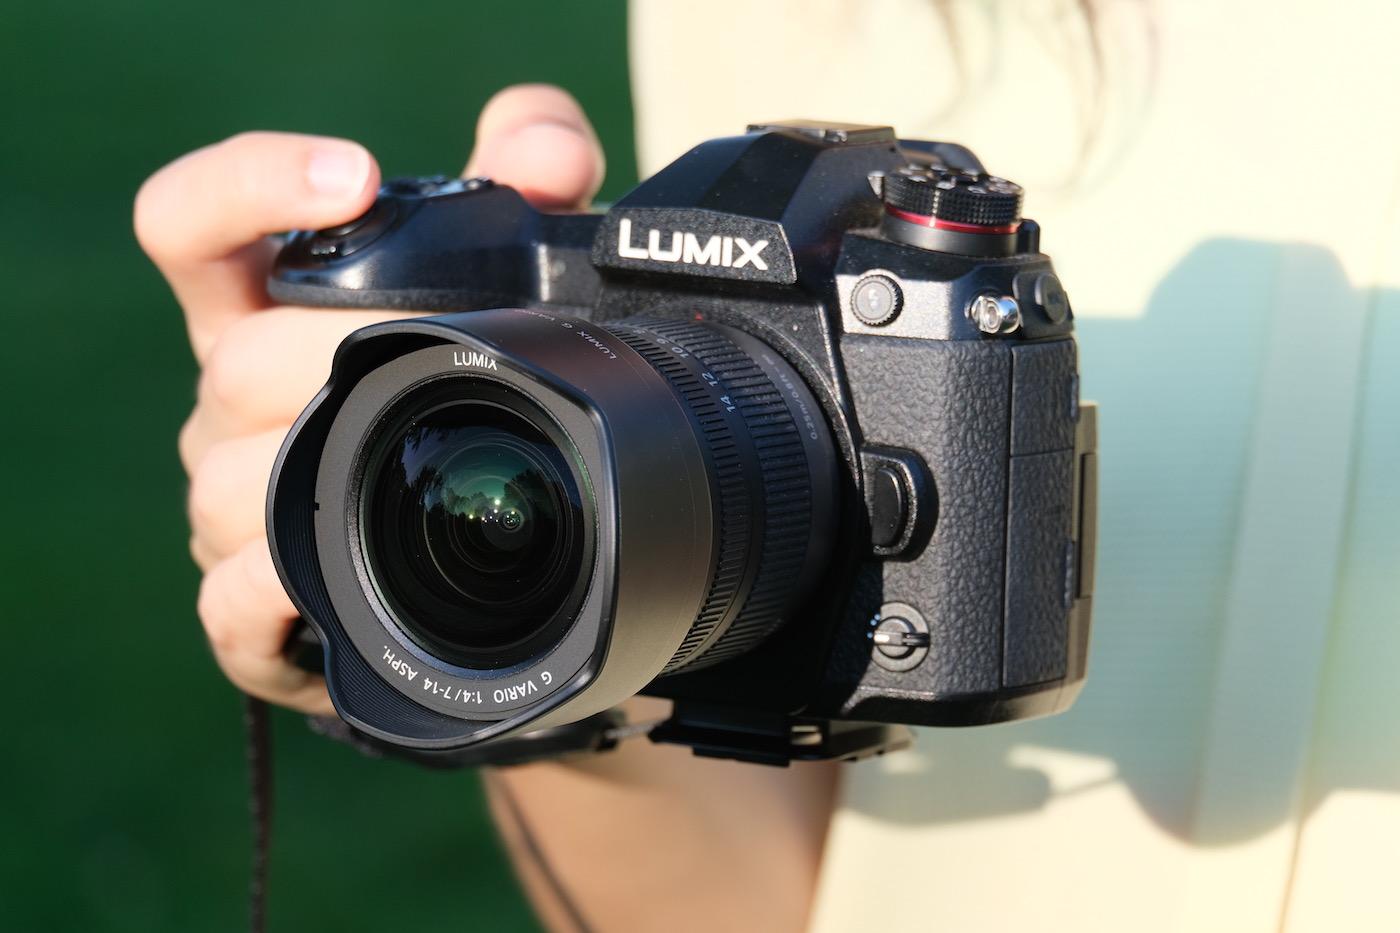 Panasonic 7-14mm f4.0 + LUmix G9